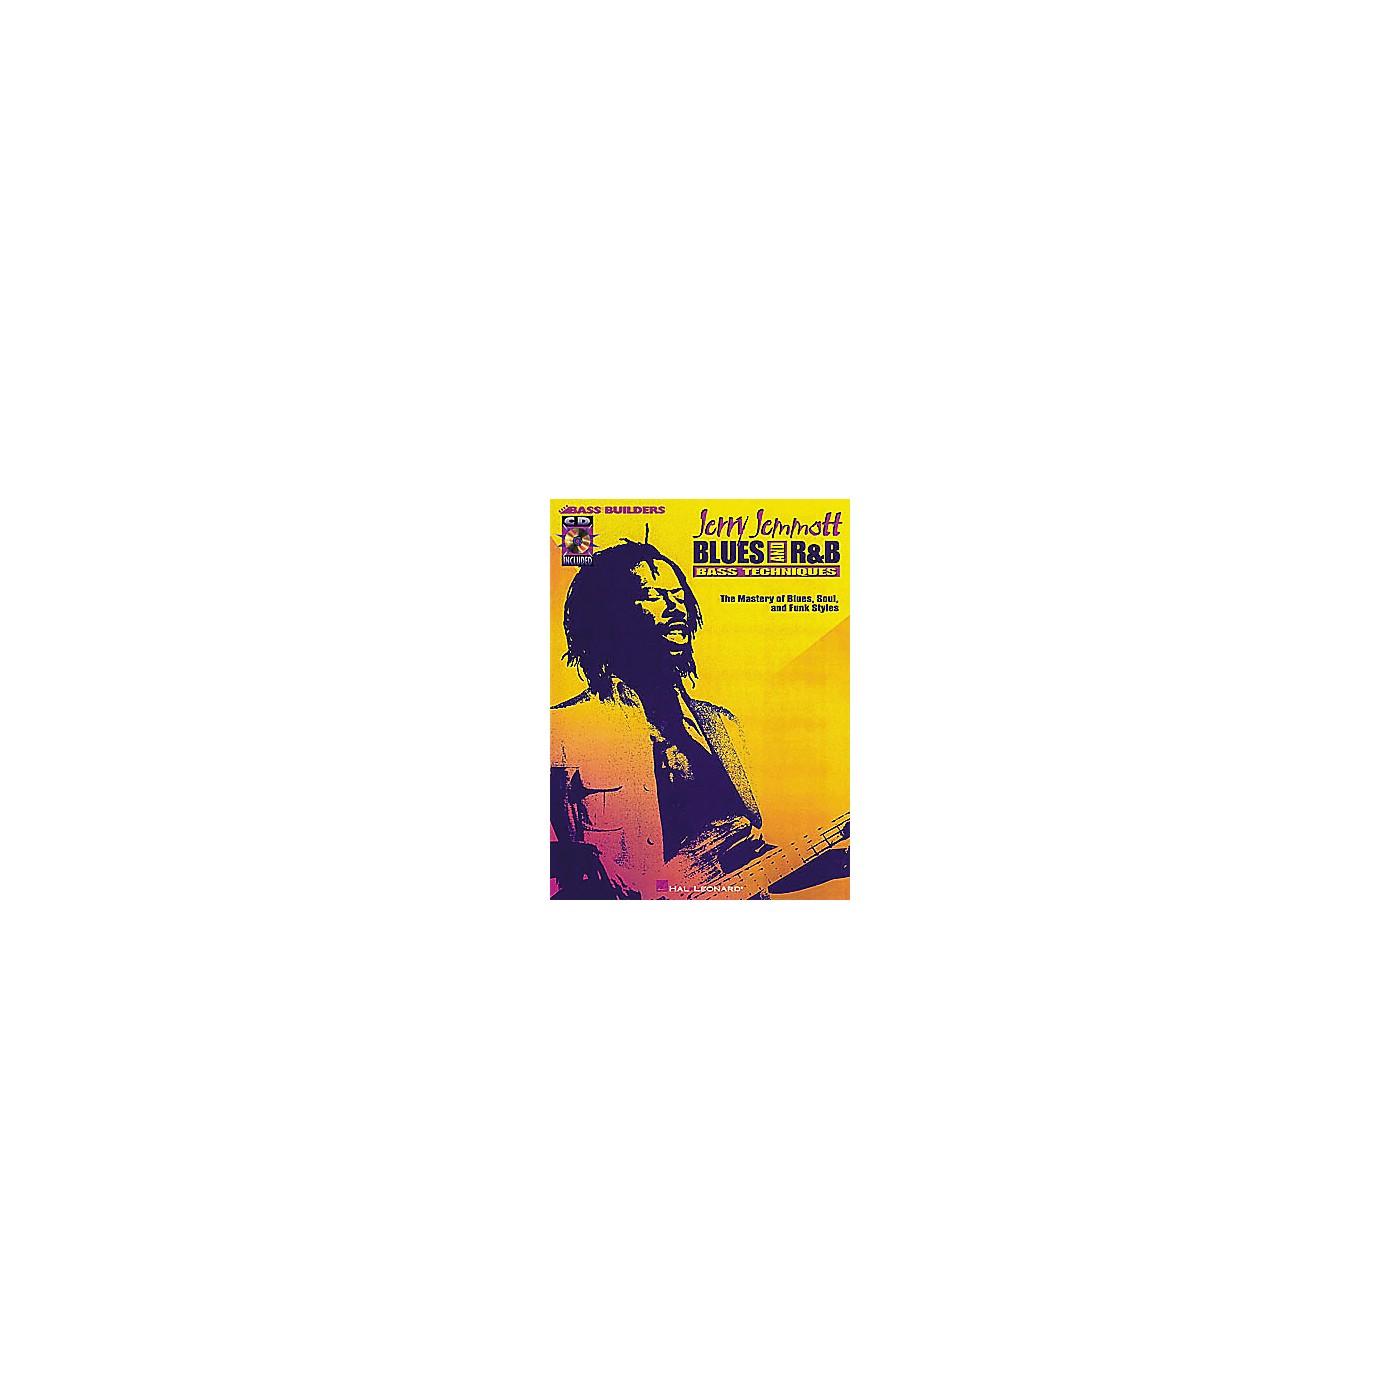 Hal Leonard Jerry Jemmott - Blues and Rhythm and Blues Bass Technique (Book/CD) thumbnail